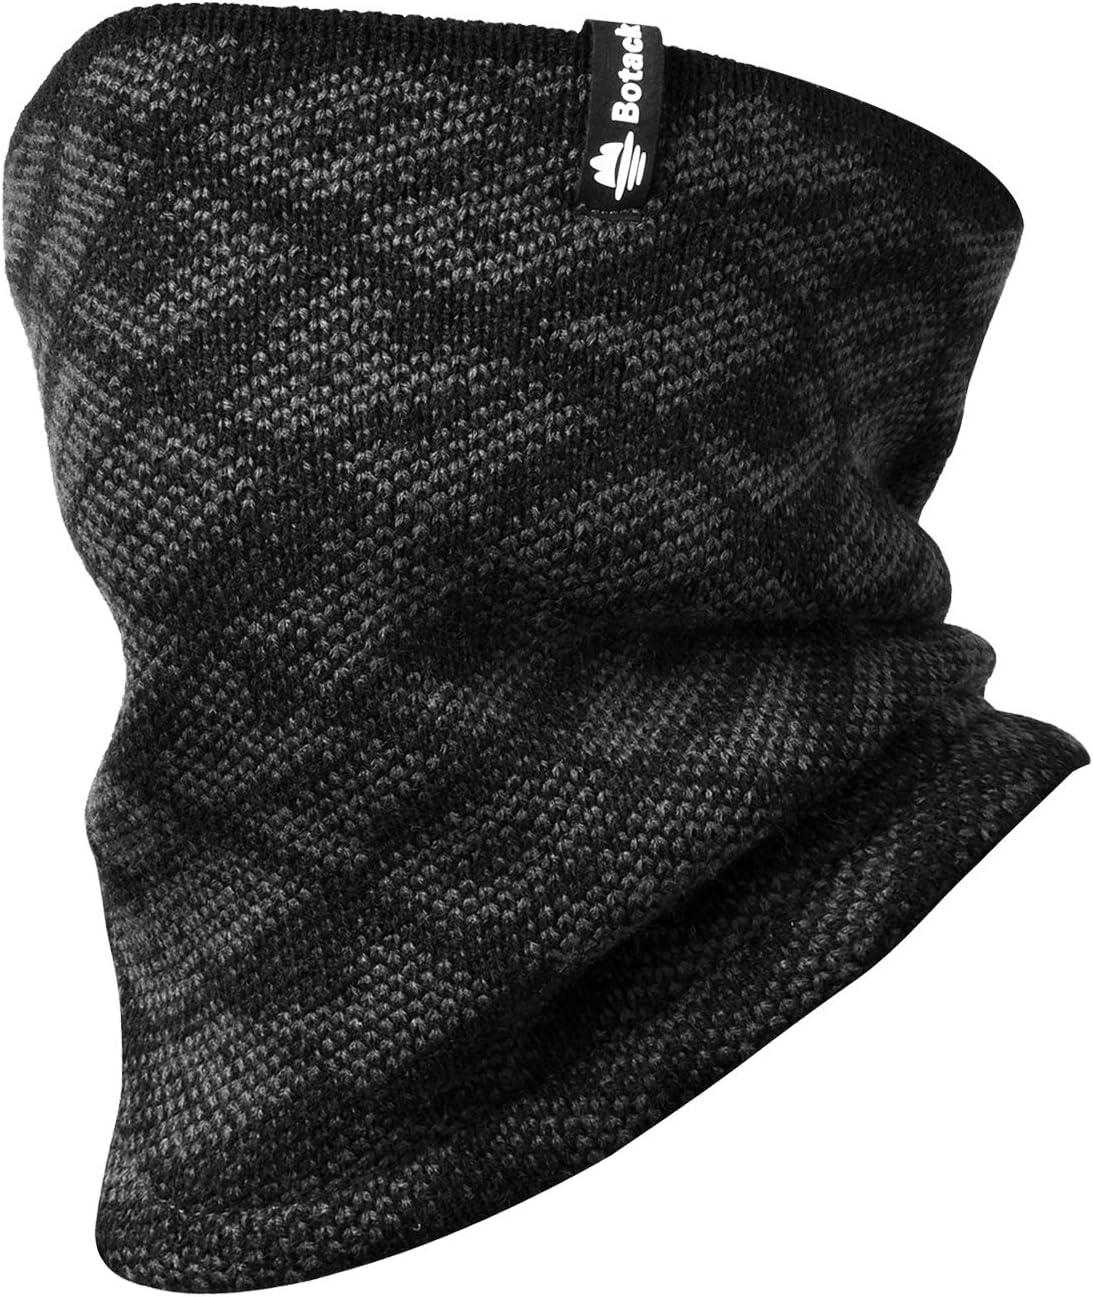 Mens Balaclava Black 3 Hole SAS Design 40 Grams 3M Thinsulate